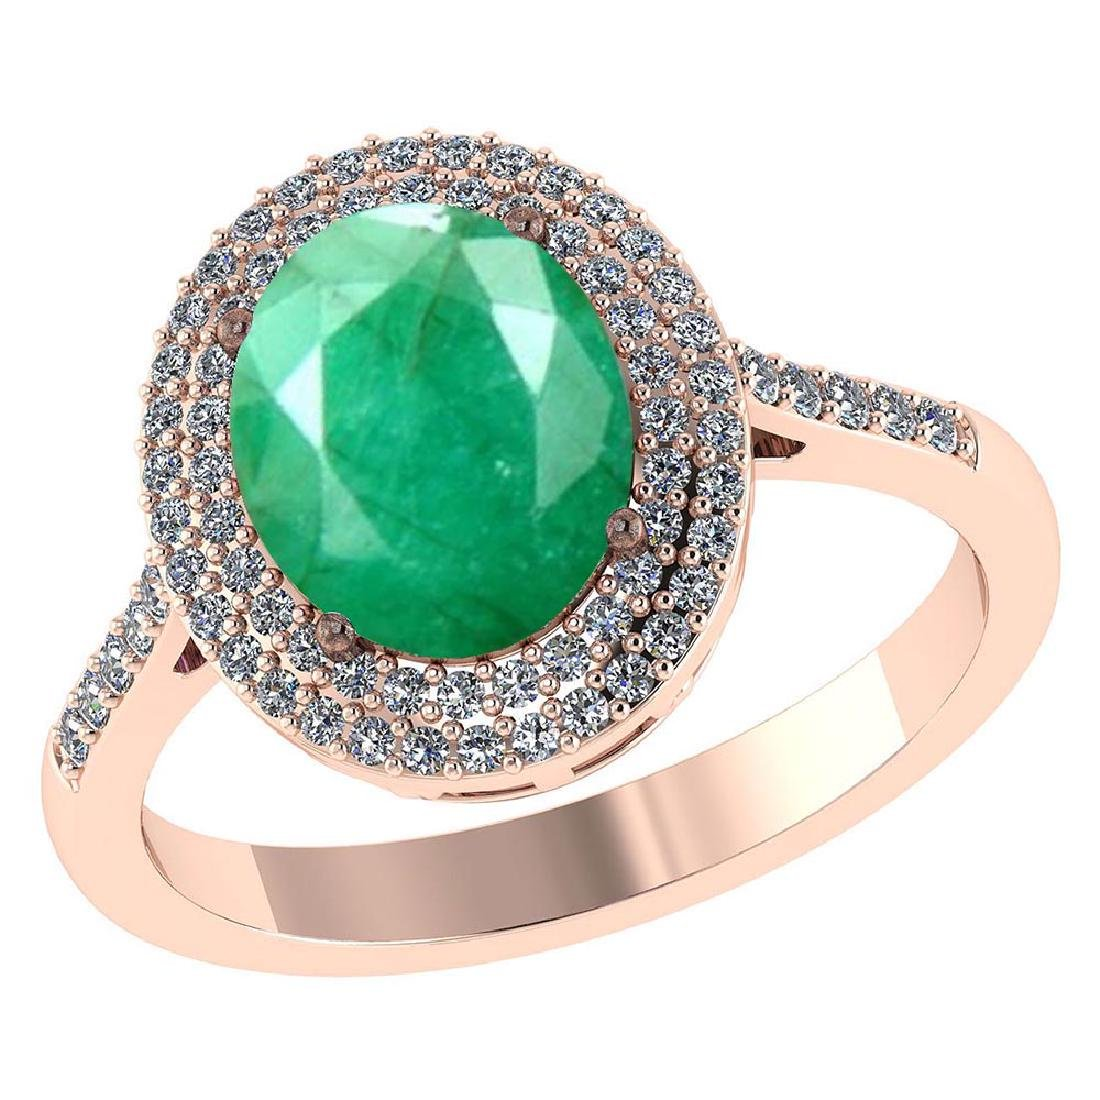 Certified 3.2 CTW Genuine Emerald And Diamond 14K Rose